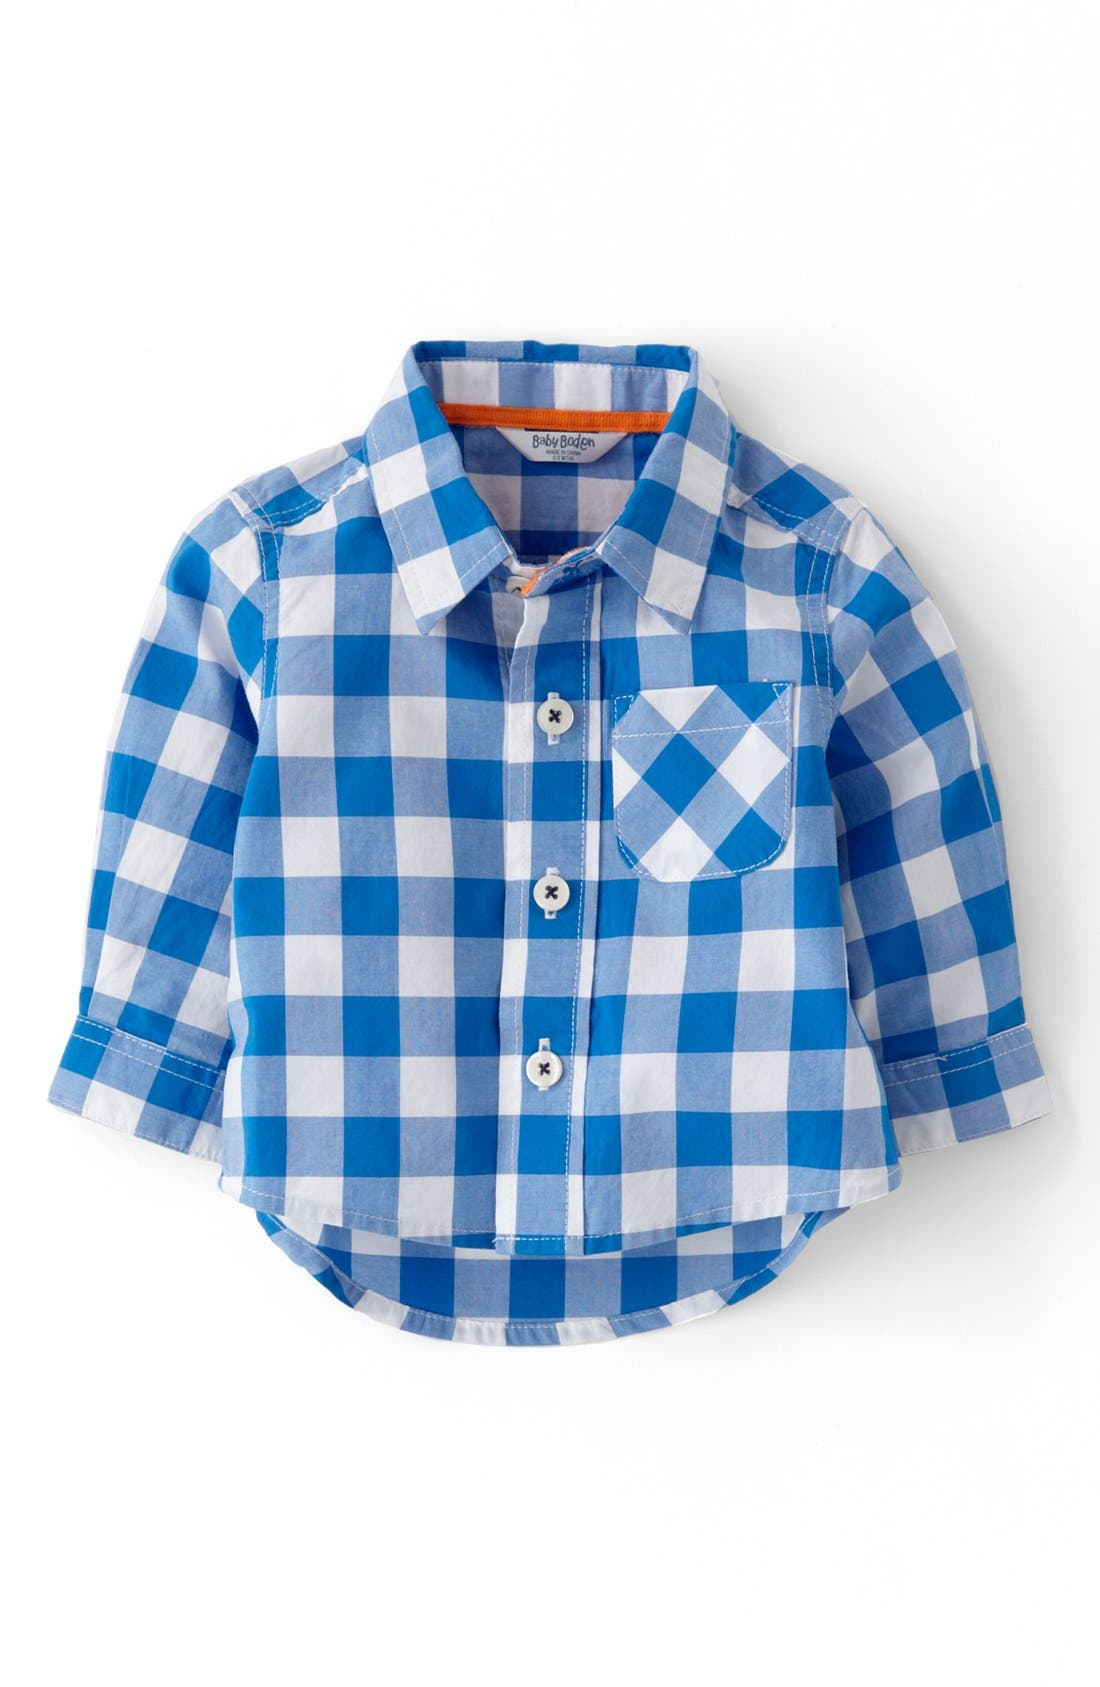 Alternate Image 1 Selected - Mini Boden 'Laundered' Woven Shirt (Baby Boys)